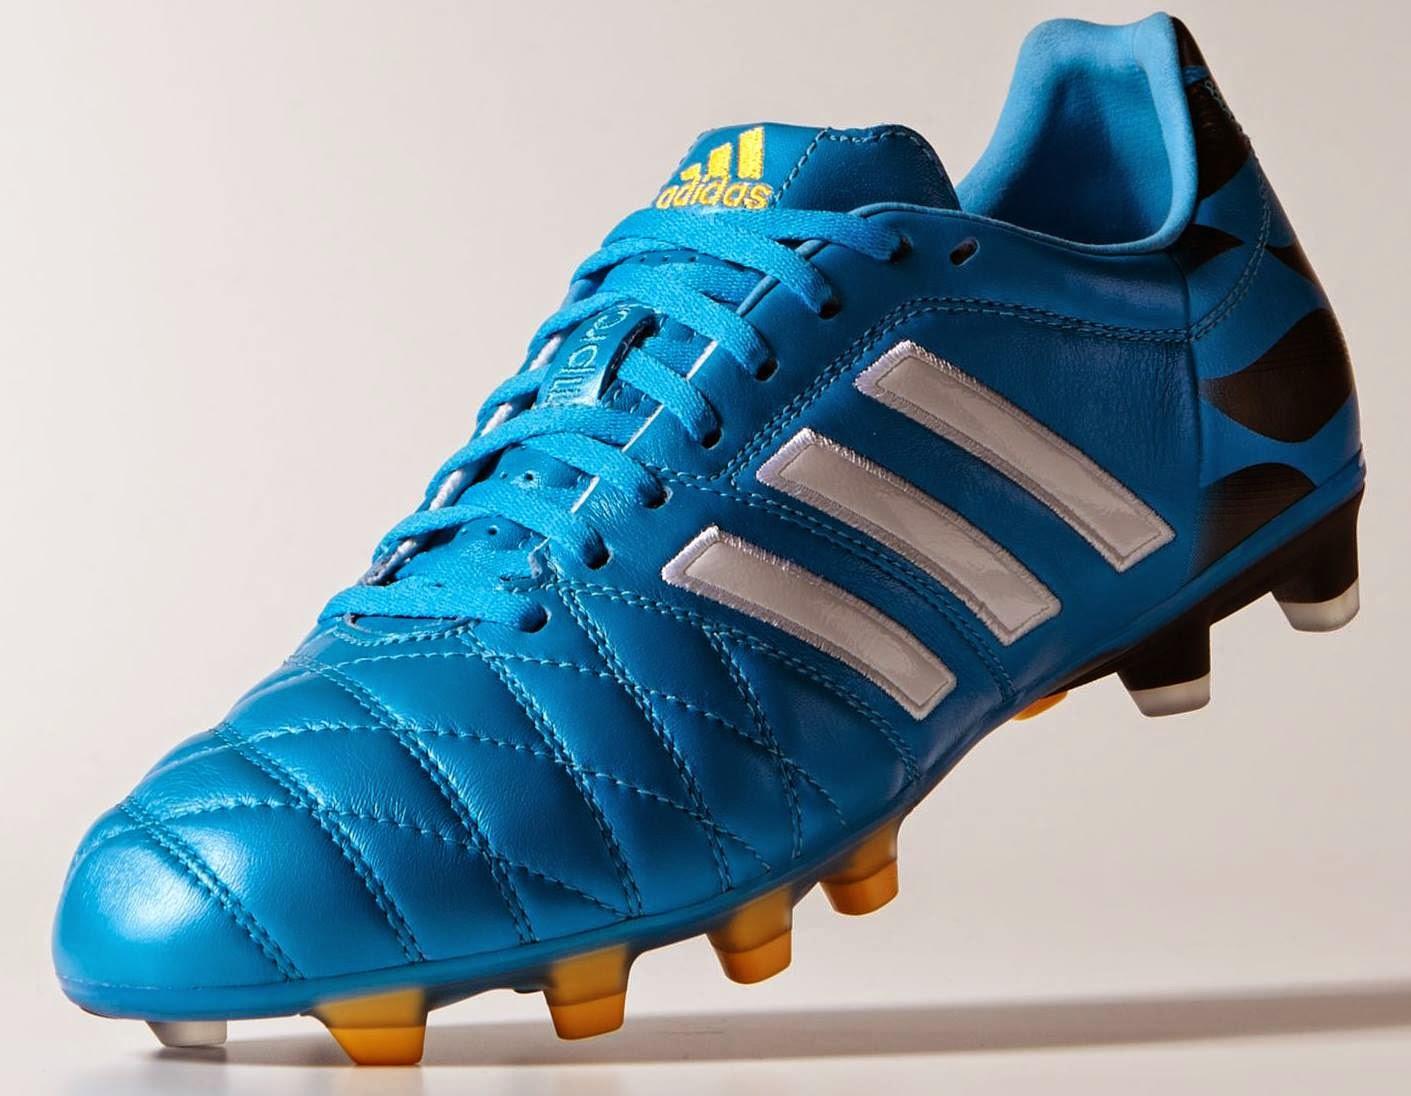 the best attitude d2b1a 7bc5c adidas+11pro+ +Tribal+Pack. botines adidas azul y rosa